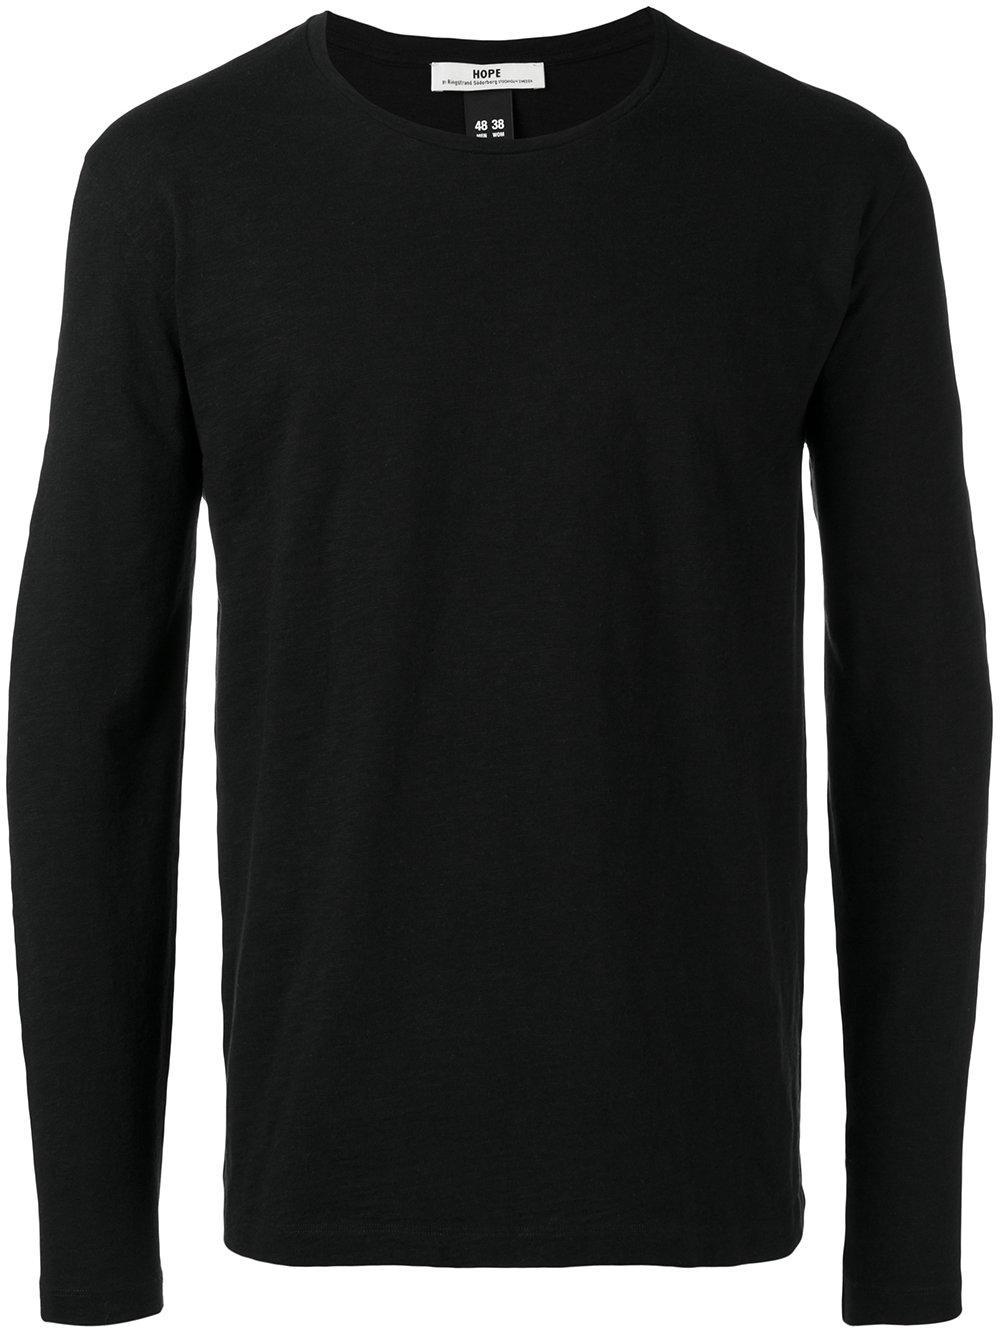 Lyst Hope Sander Sweatshirt In Black For Men